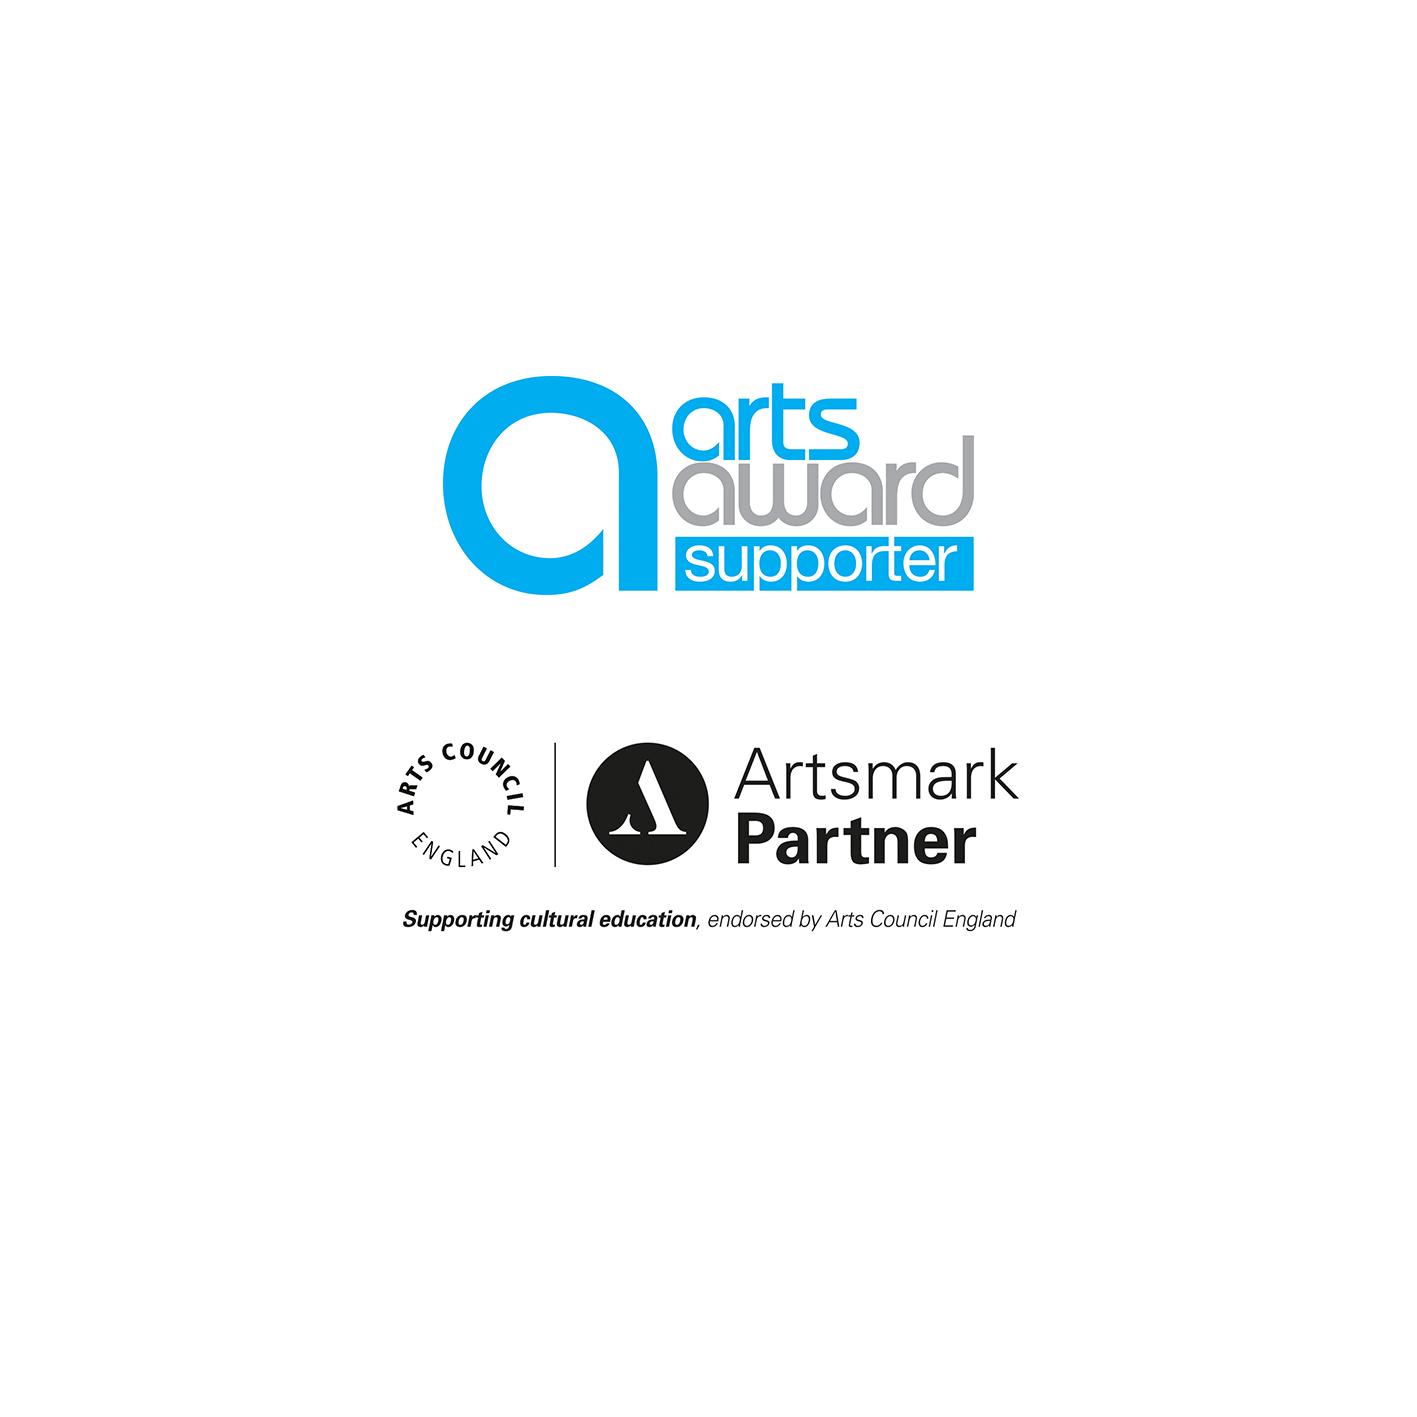 Artsmark and arts award logos